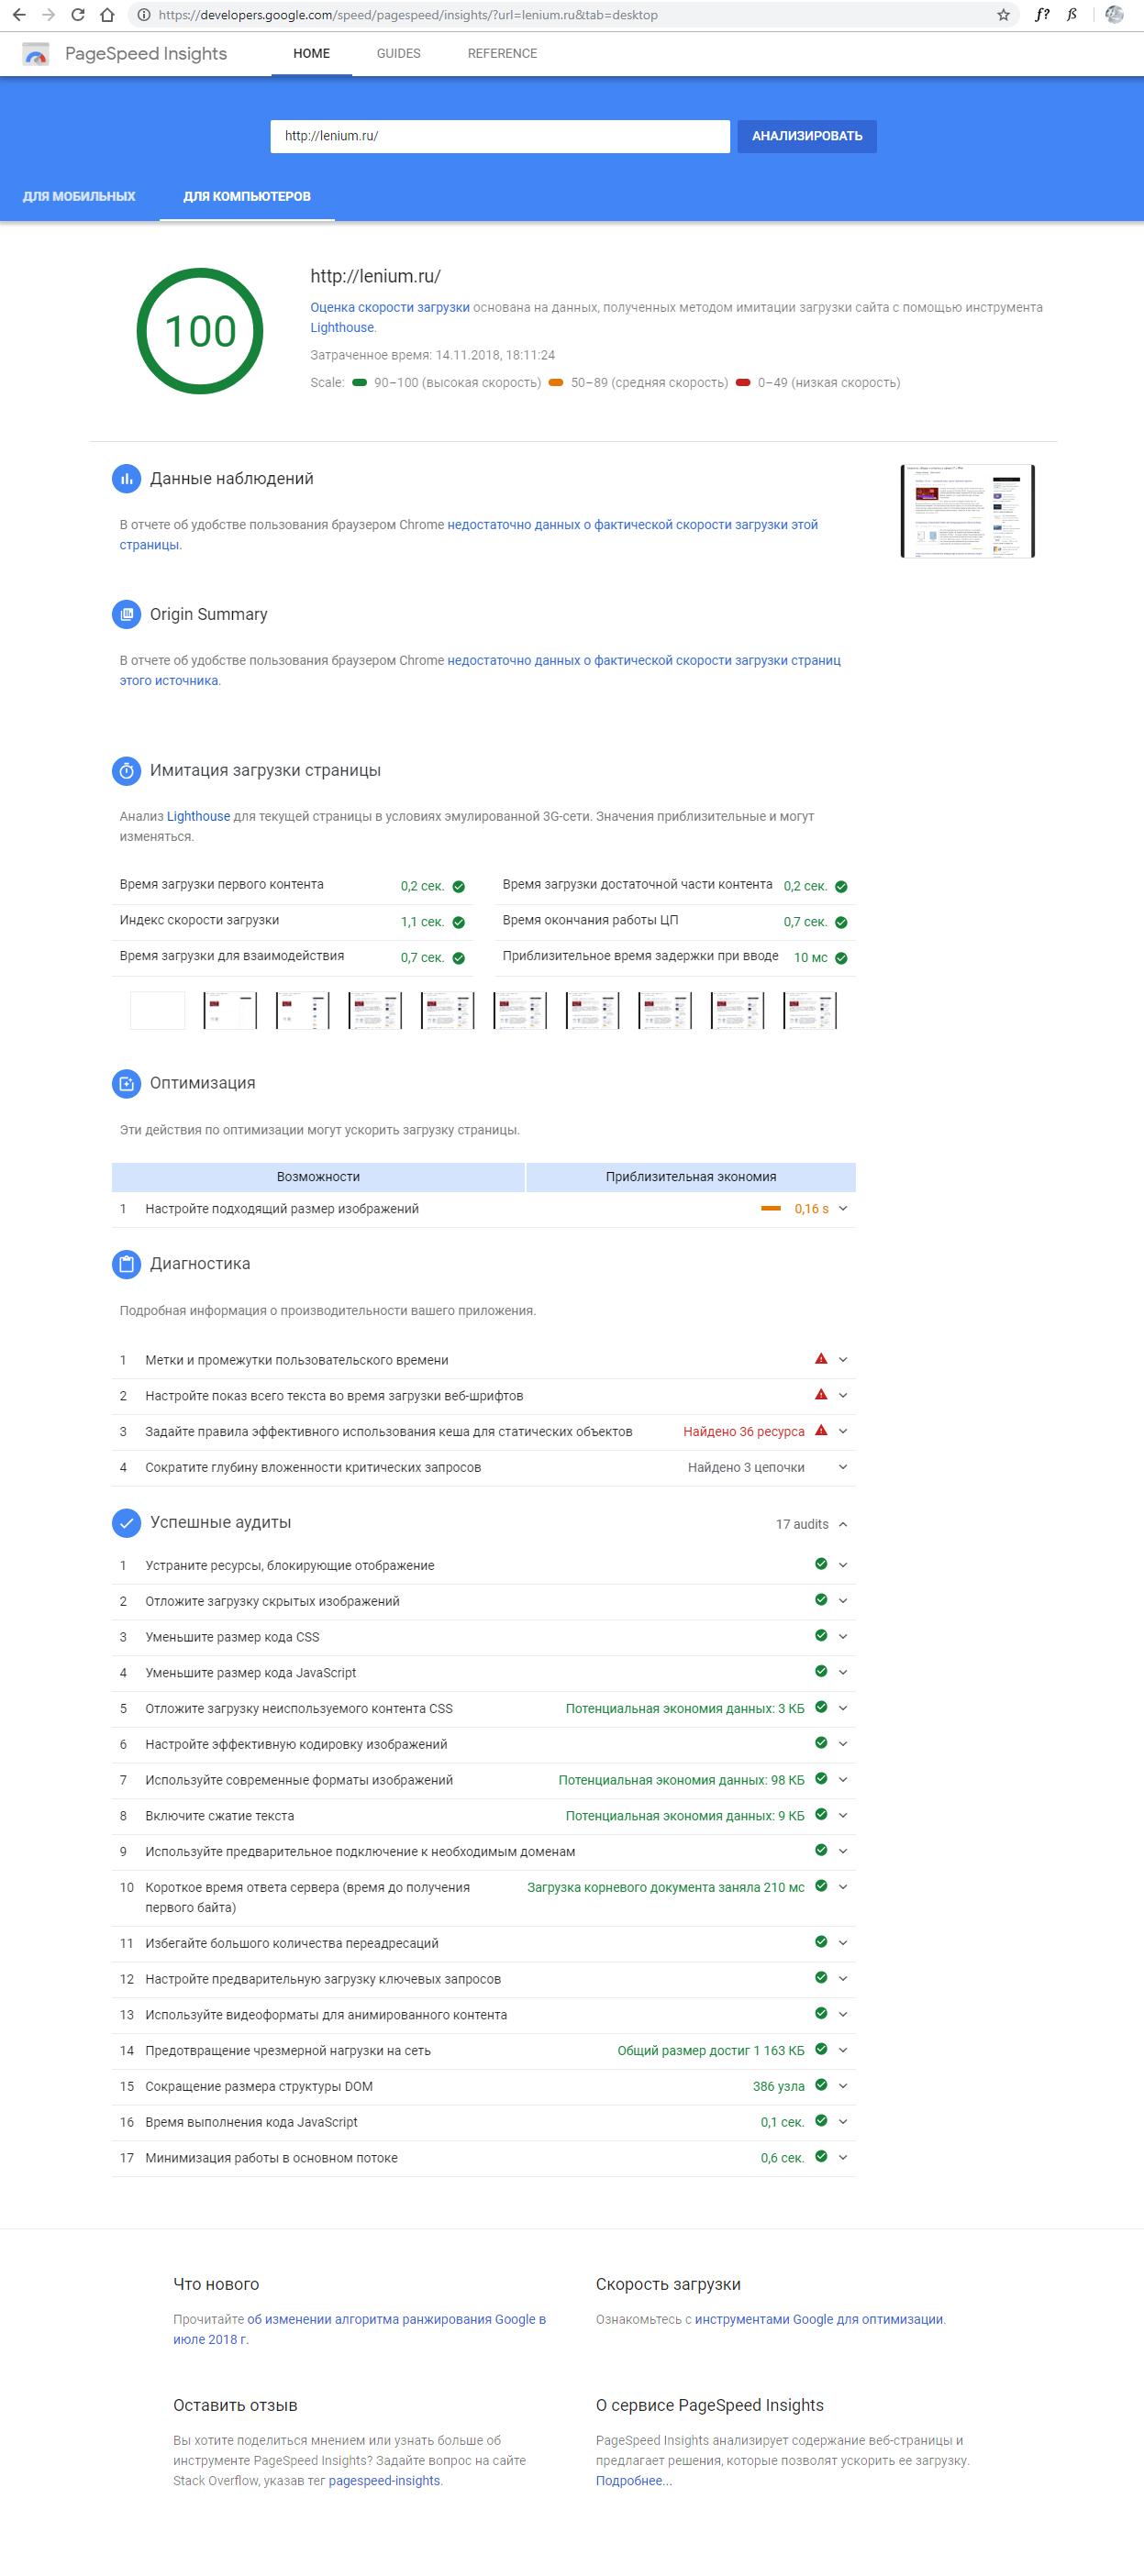 Обновление и редизайн Google сервиса Page Speed Insights 1 - lenium.ru